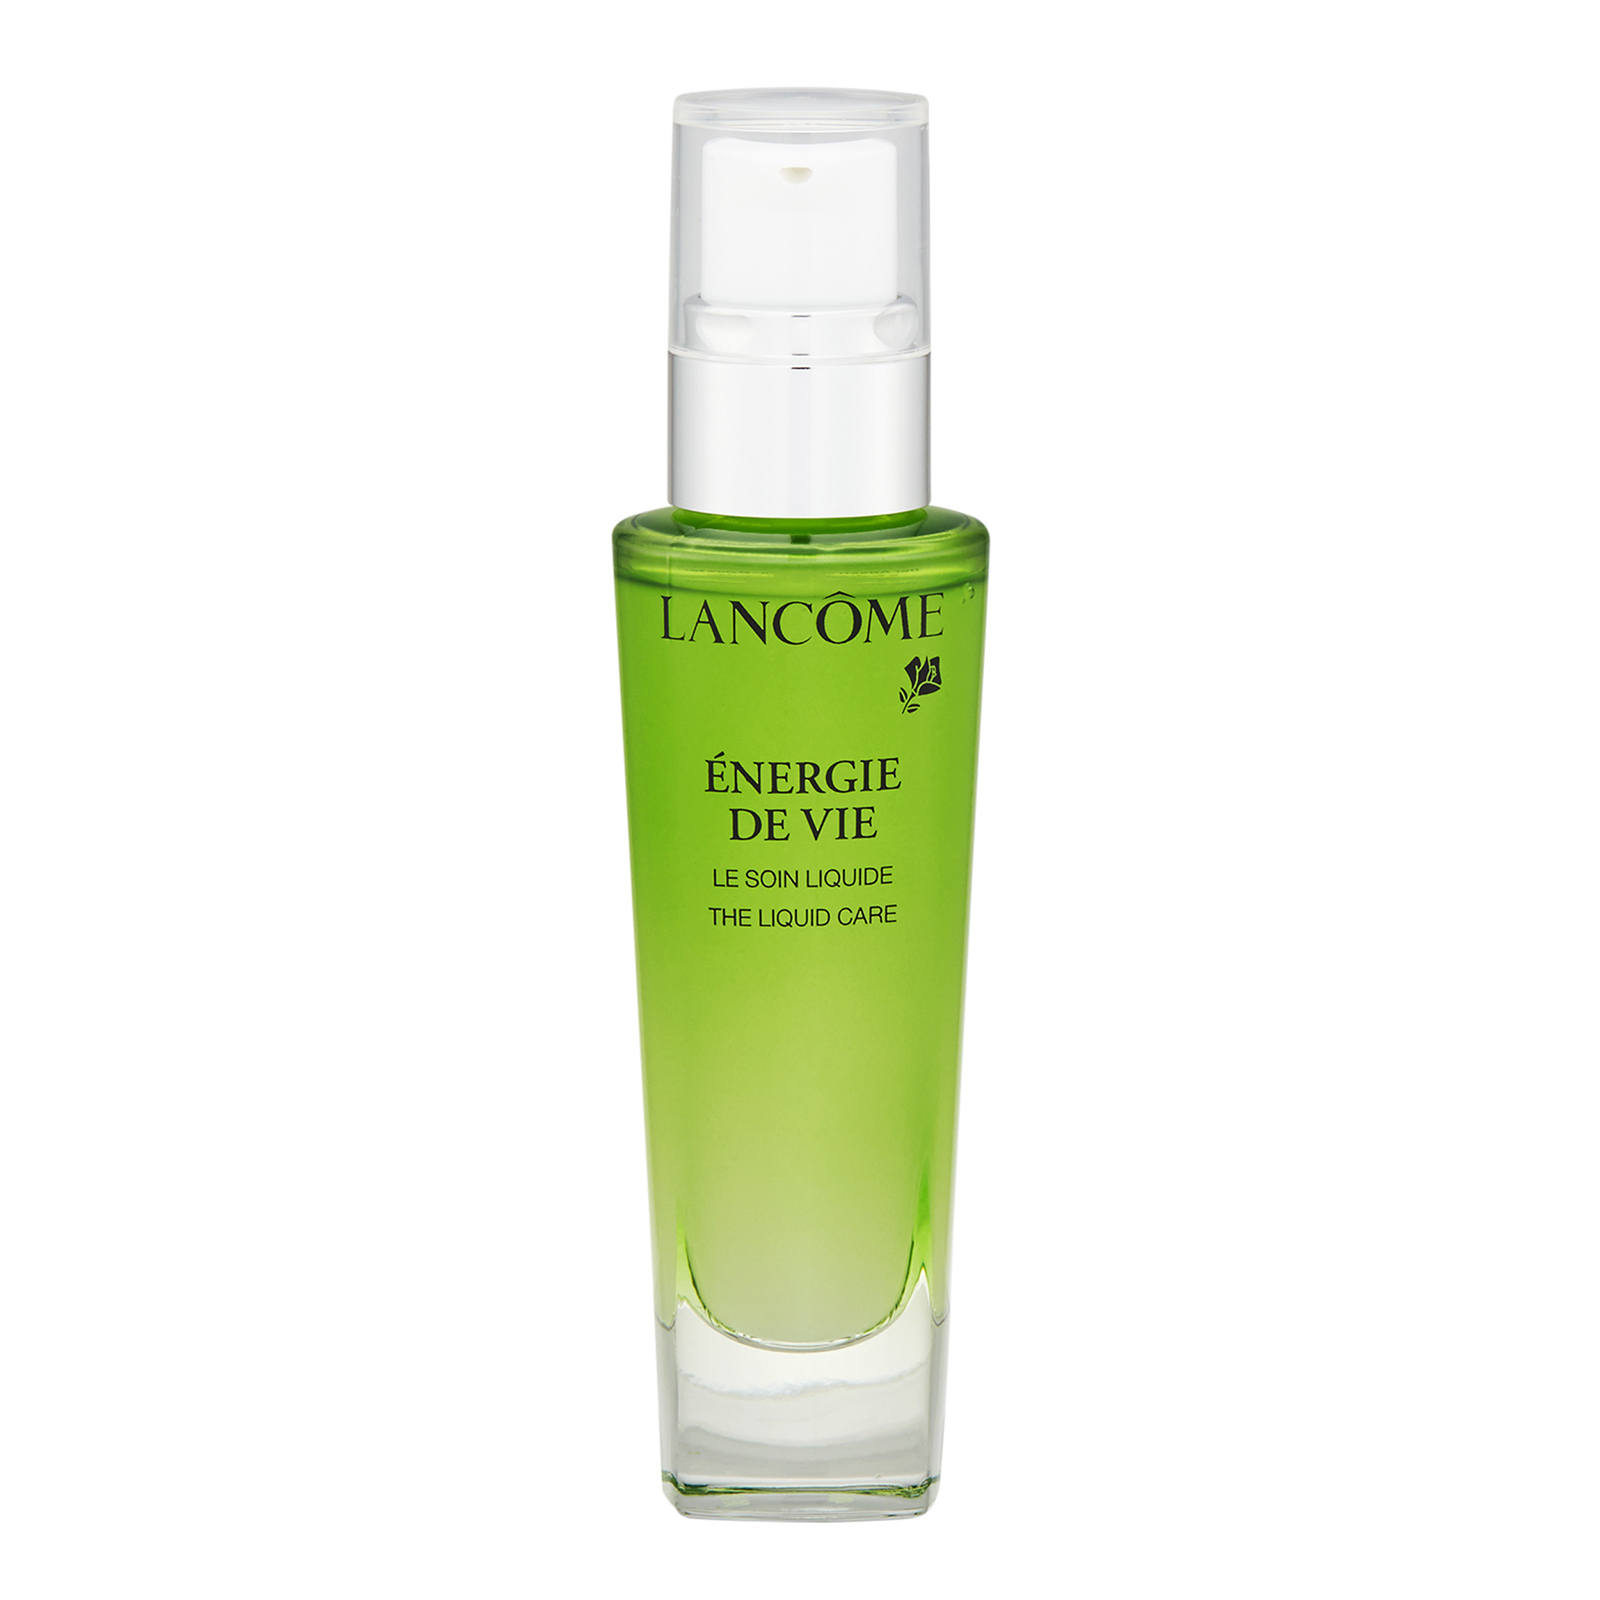 LANCÔME Energie De Vie  The Smoothing & Glow Boosting Liquid Care 1oz, 30ml from Cosme-De.com